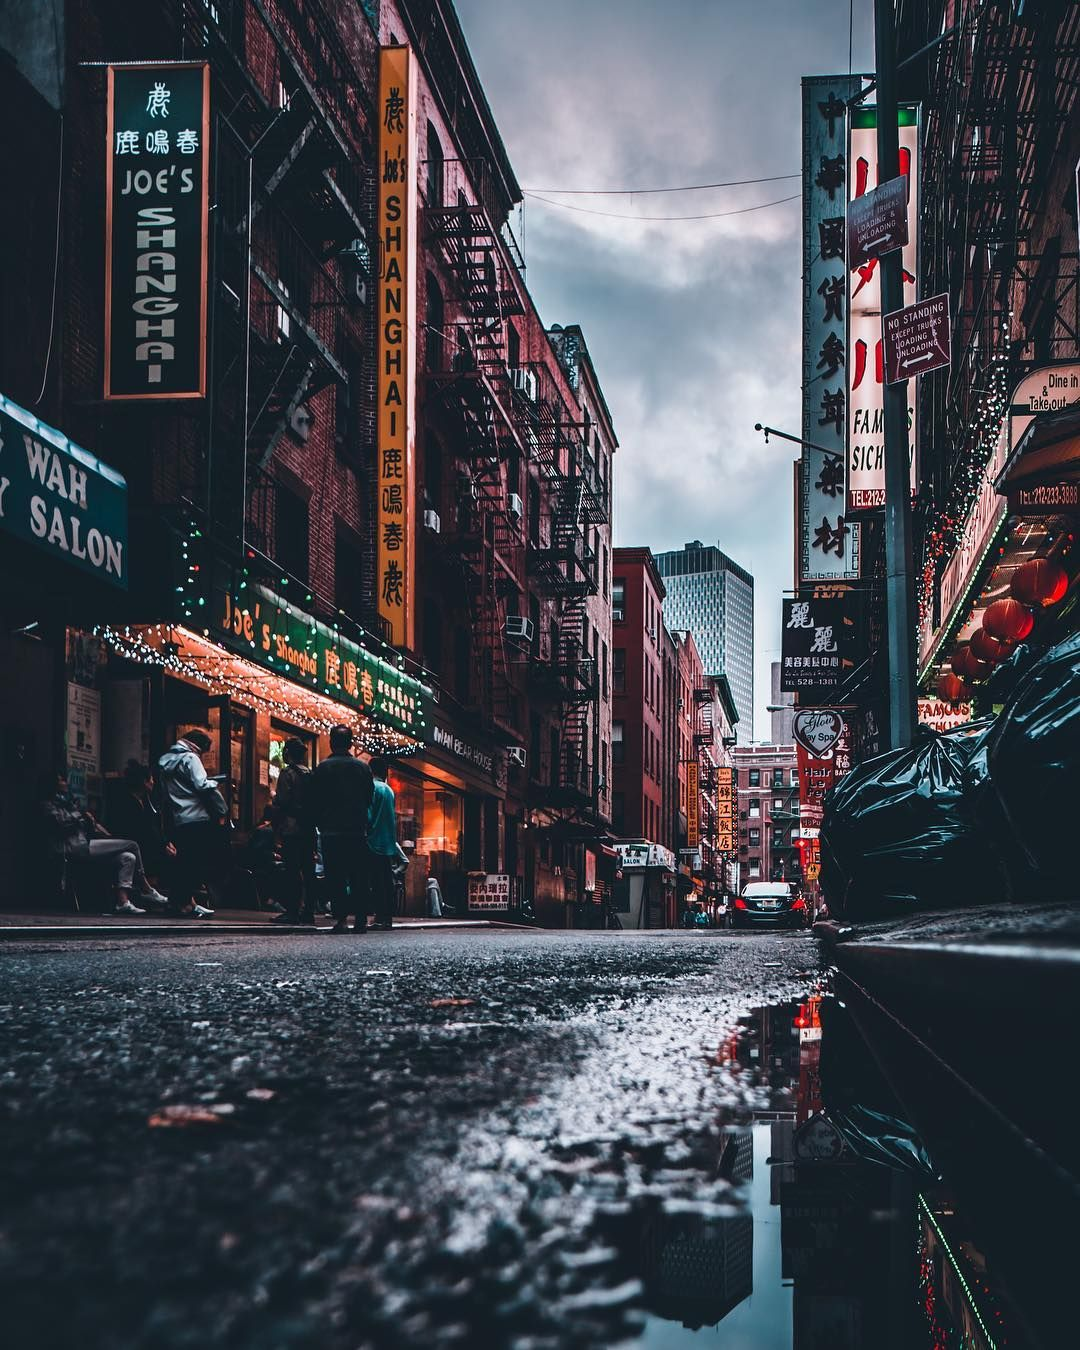 Stunning Moody Street Photos of New York City by Mazz ... City Street Photography